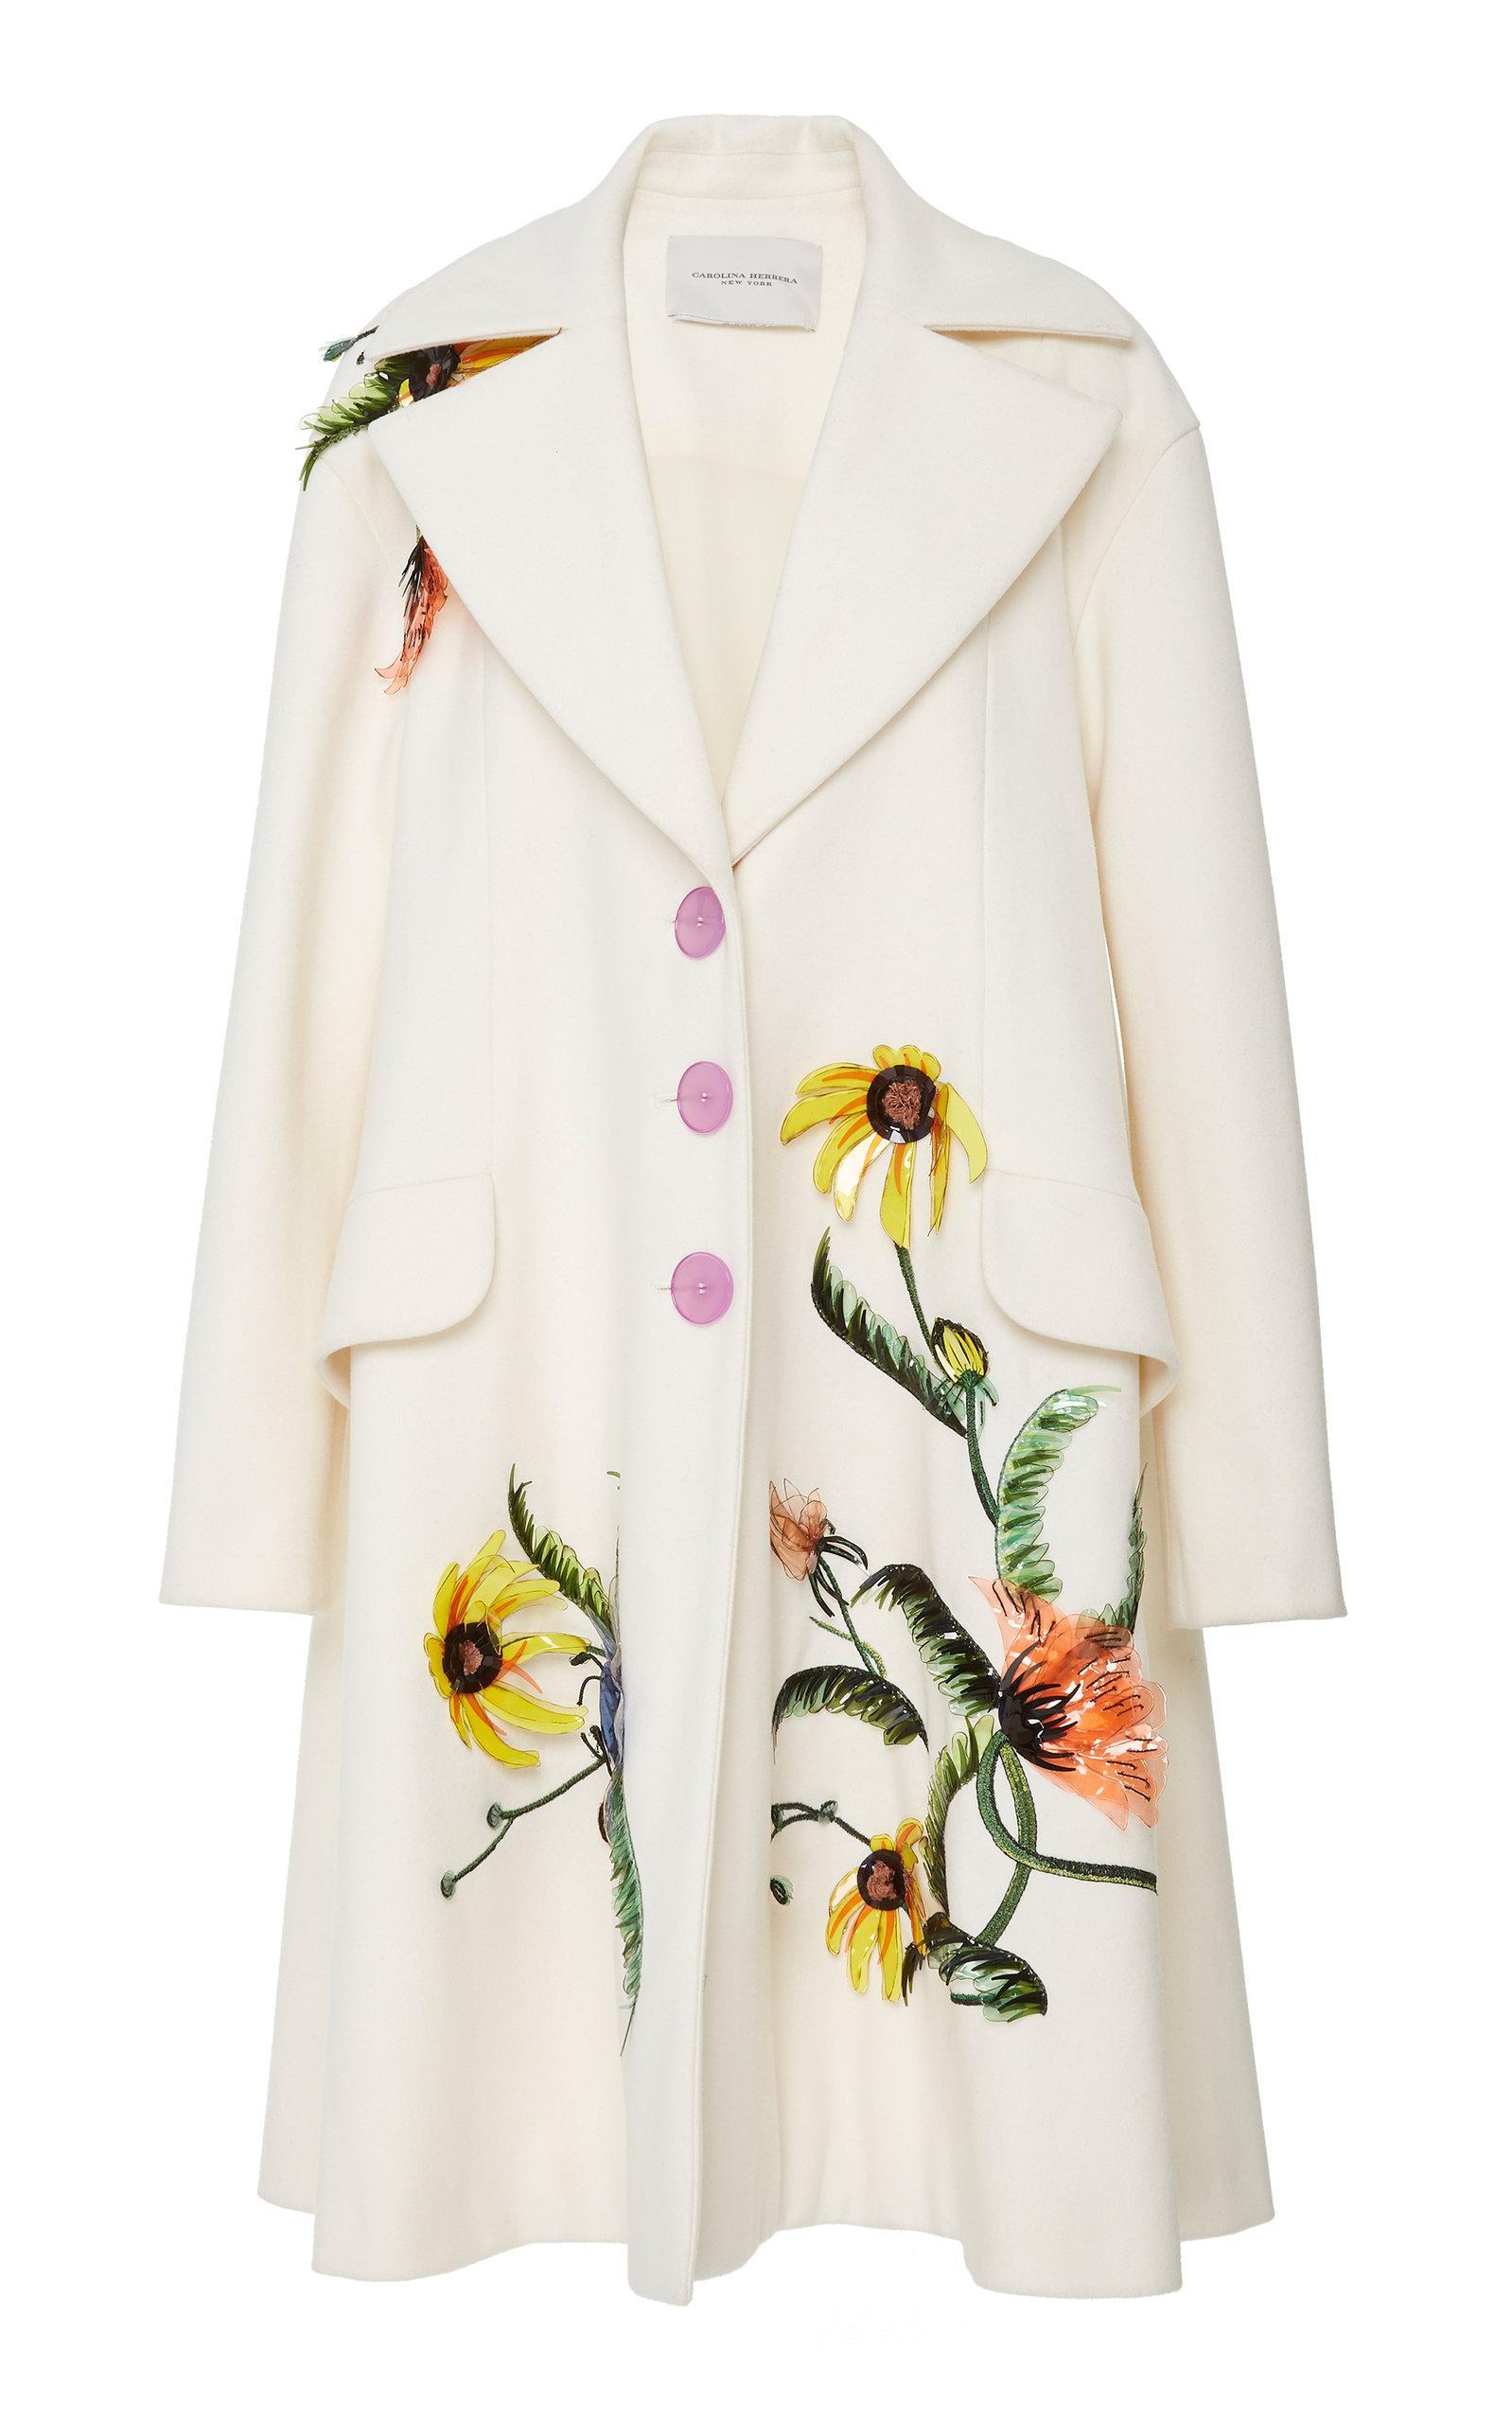 Embroidered Herrera Carolina Button Three Women's White Coat wPwqdrtUF